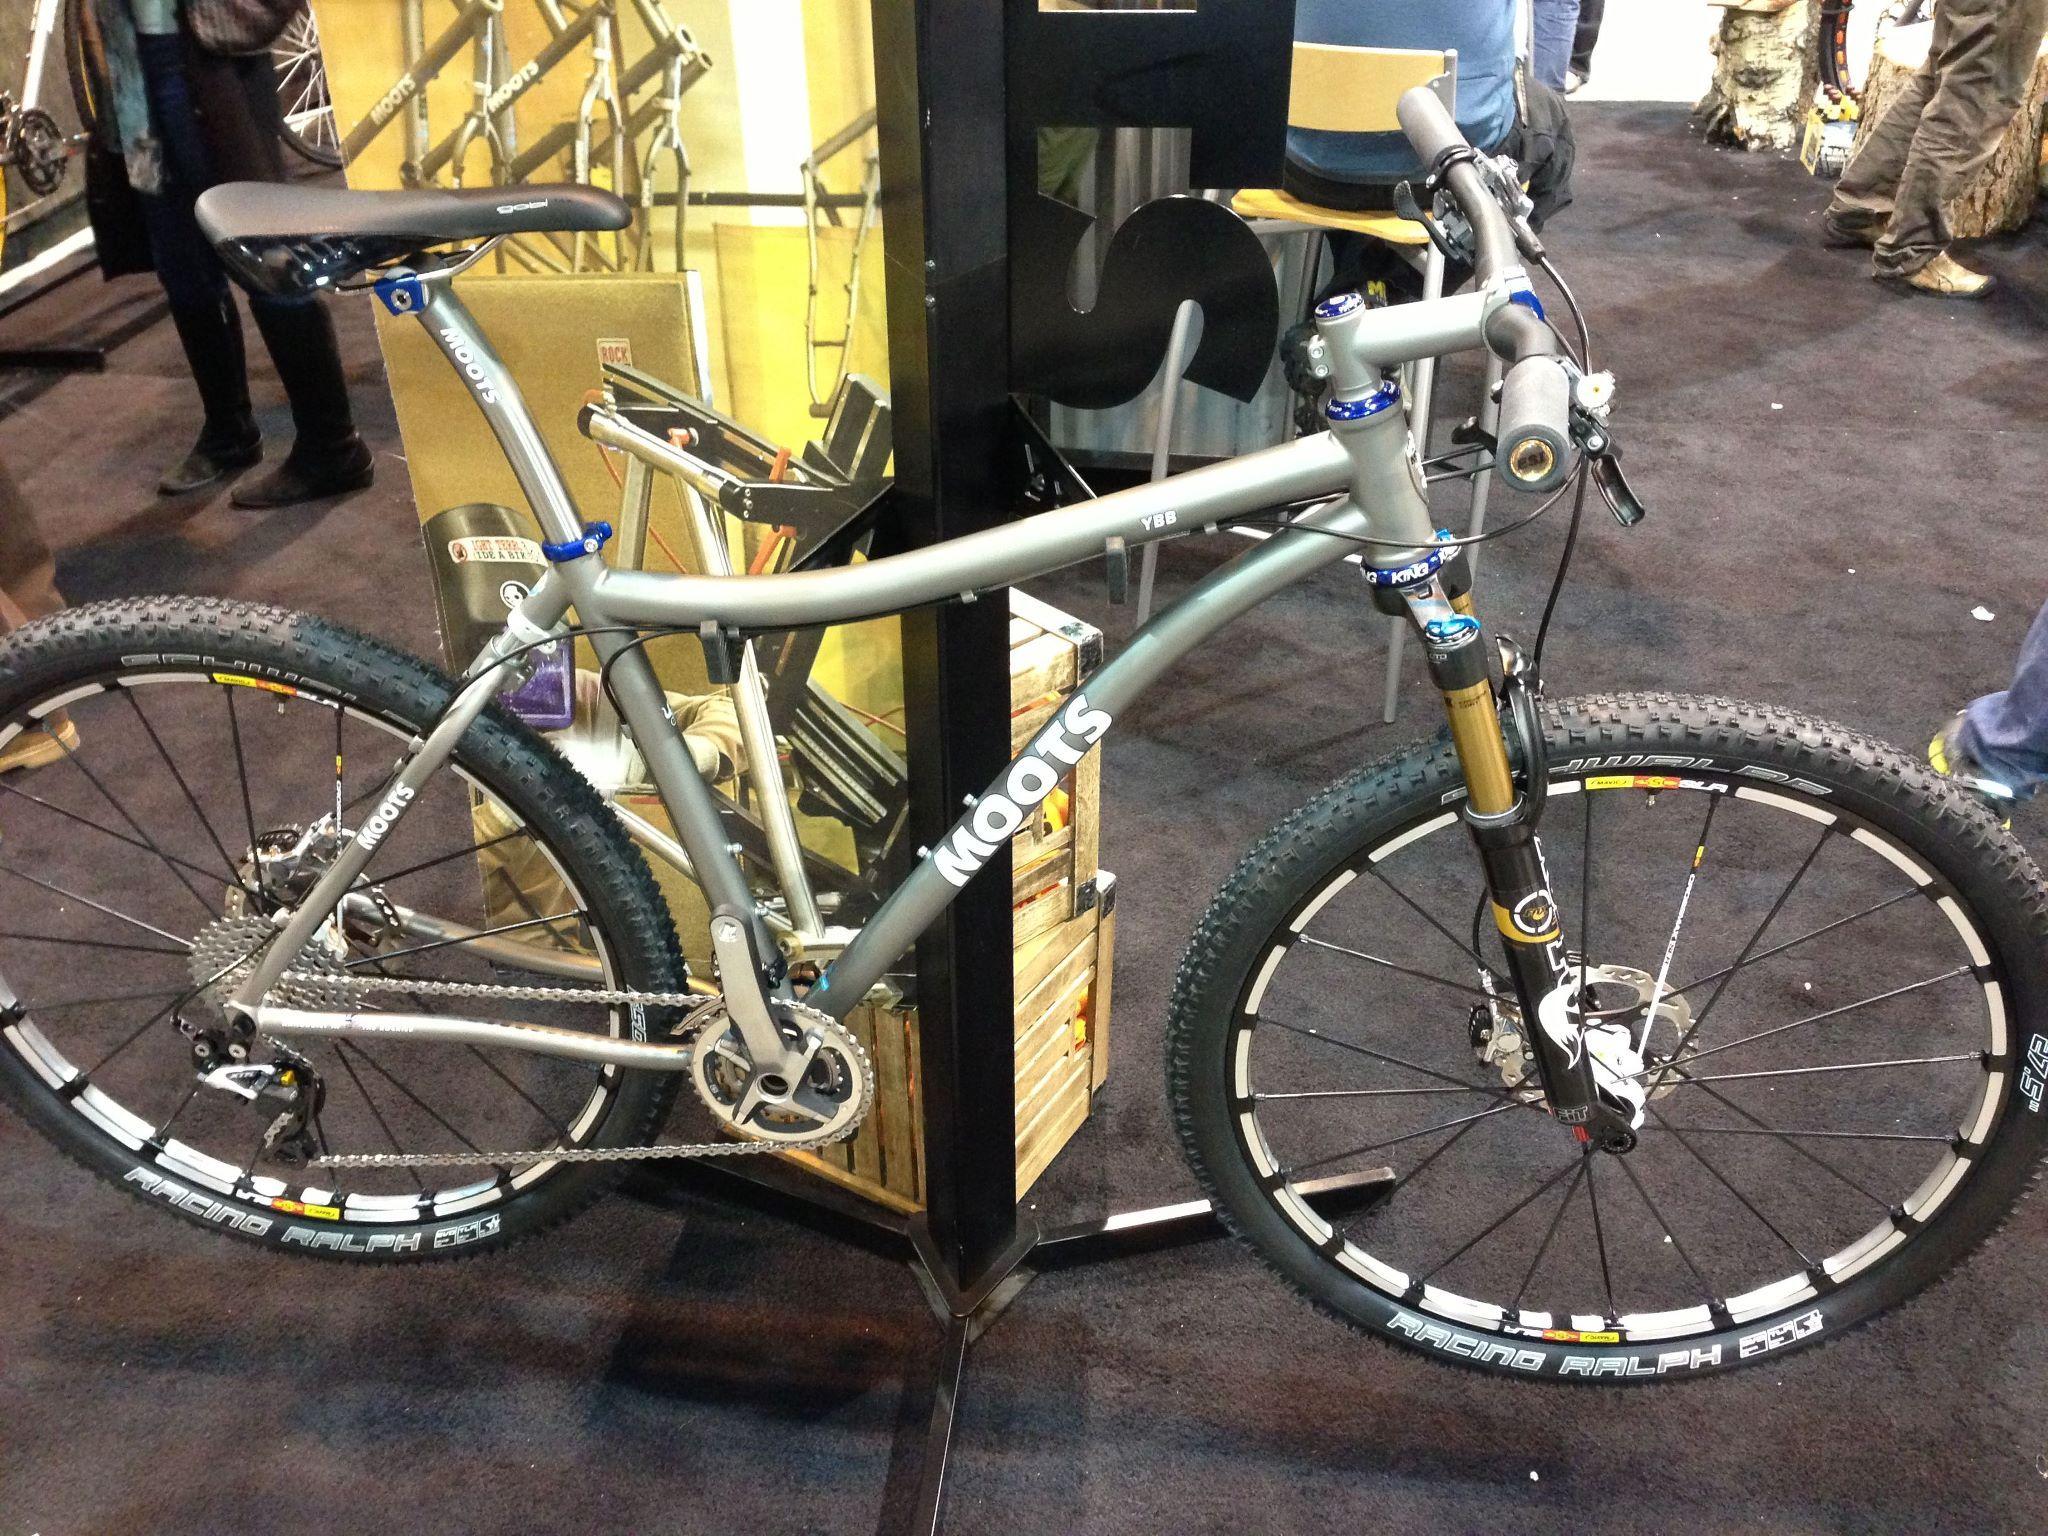 moots ybb 27 5    | likey me some bikey    | Bicycle, Bike